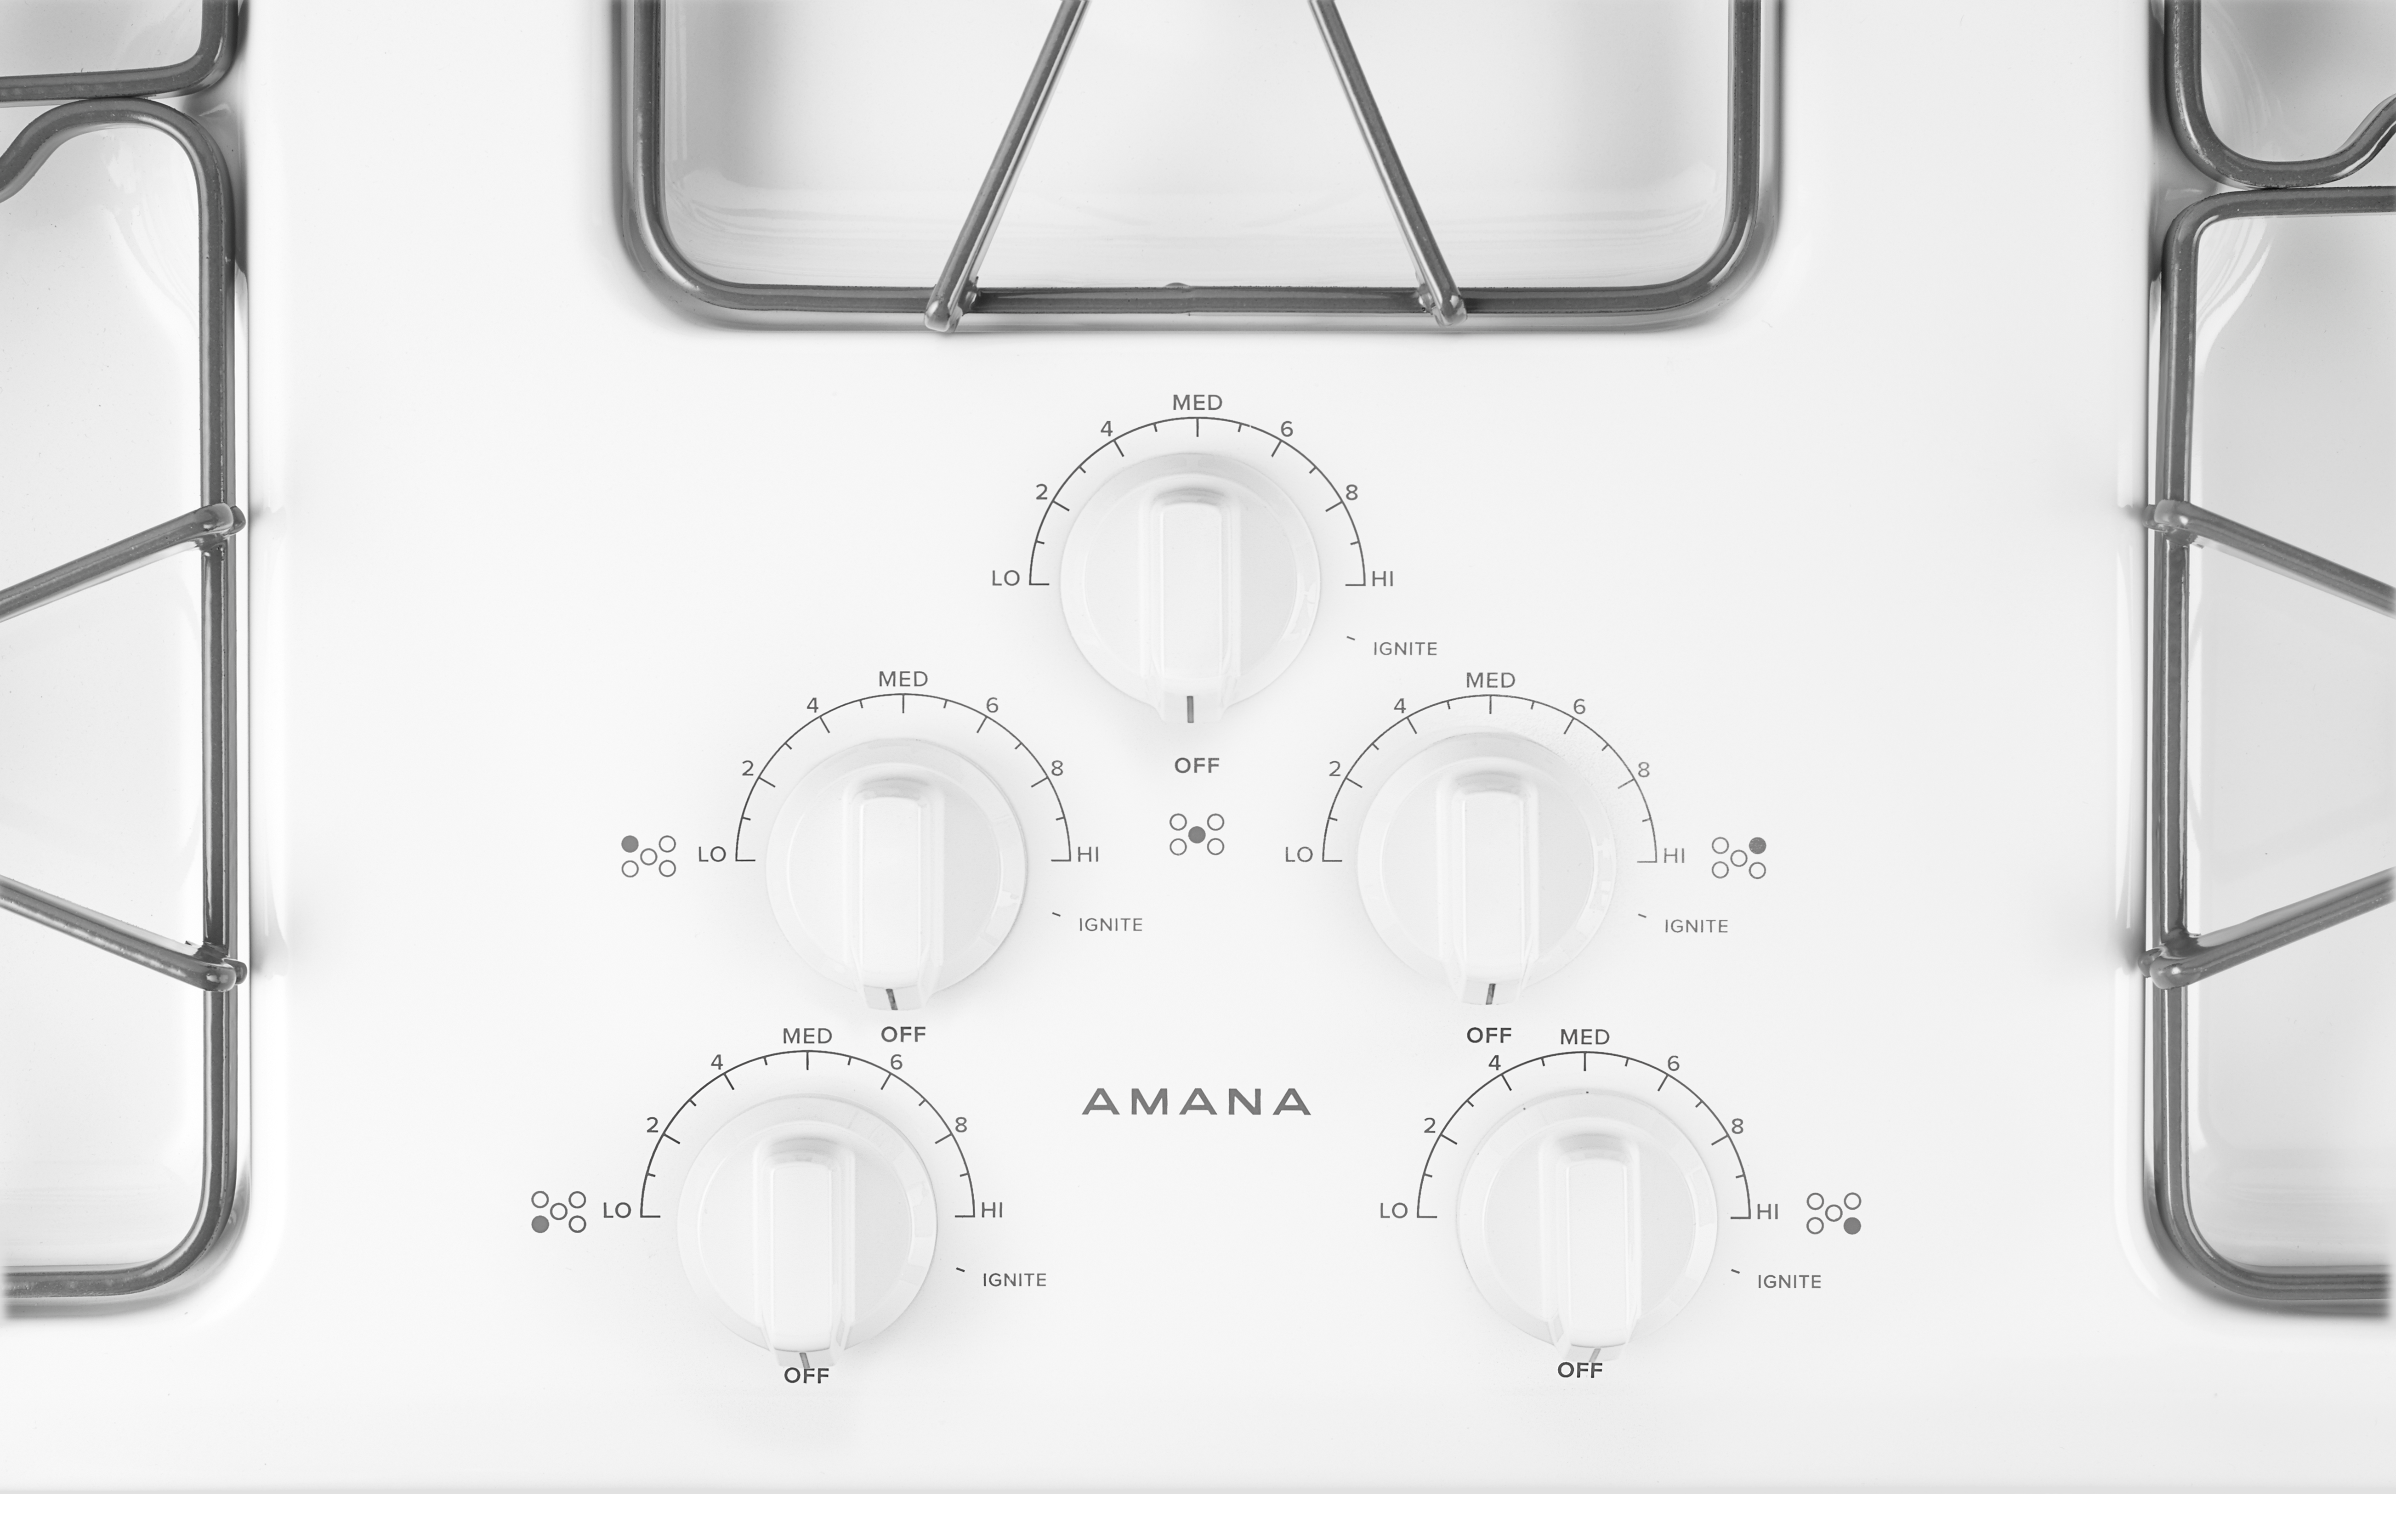 Amana 36 Gas Cooktop Agc6356kf Appliances Monroeville Pa 15146 Stove Wiring Diagram